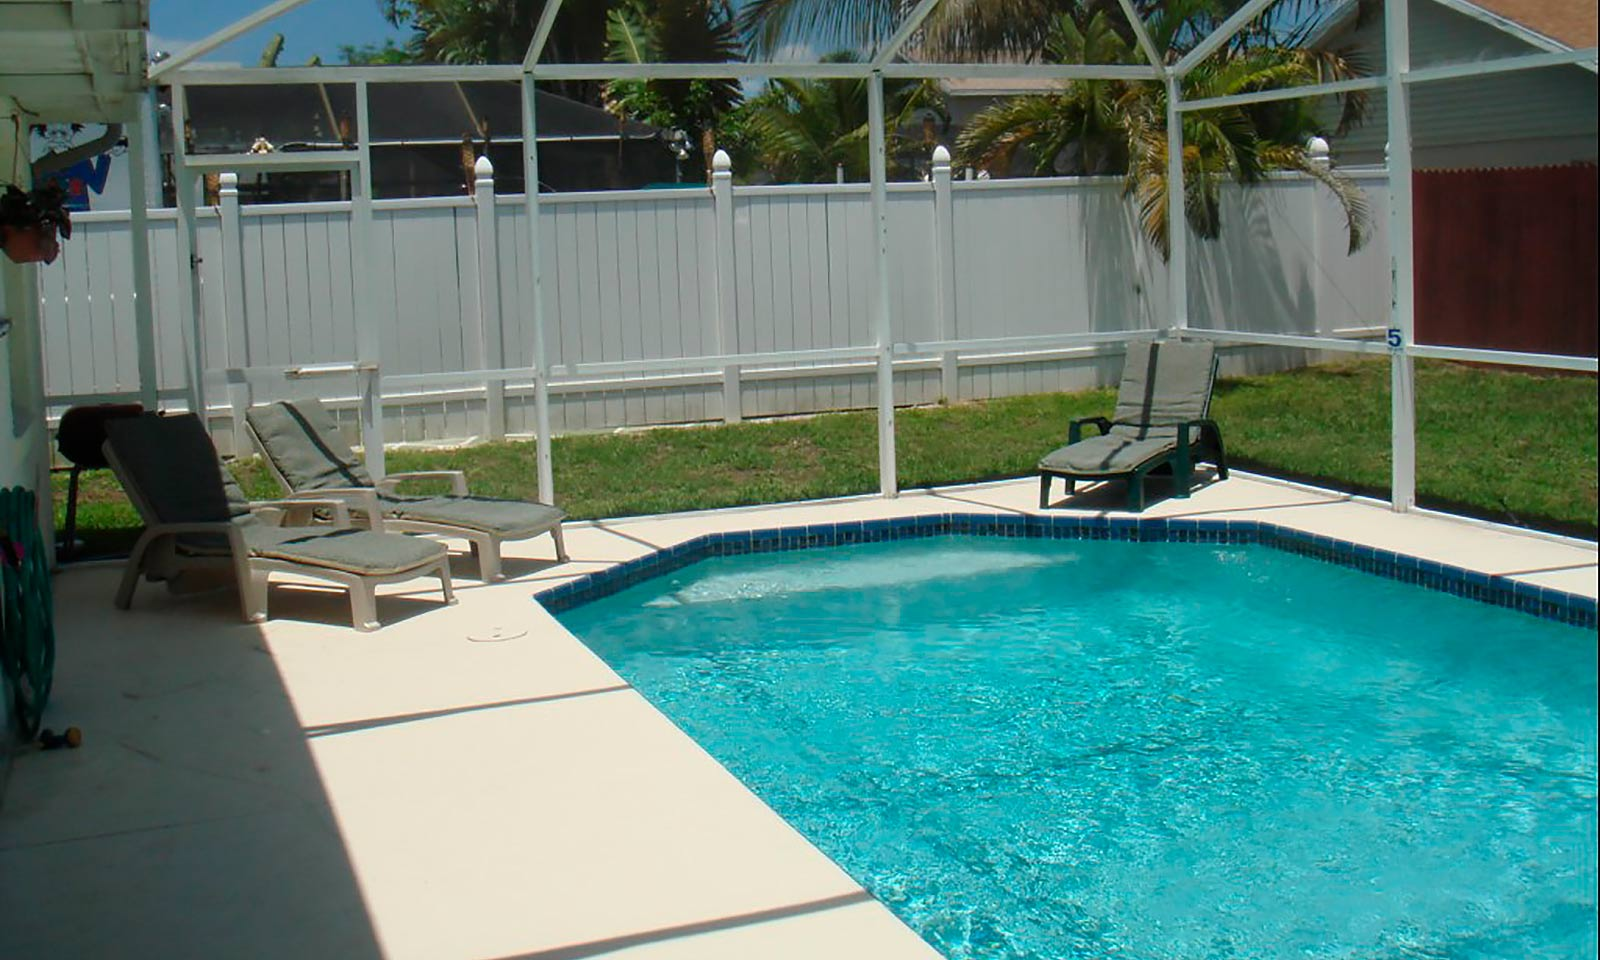 [amenities:screened-in-pool:1] Screened In Pool